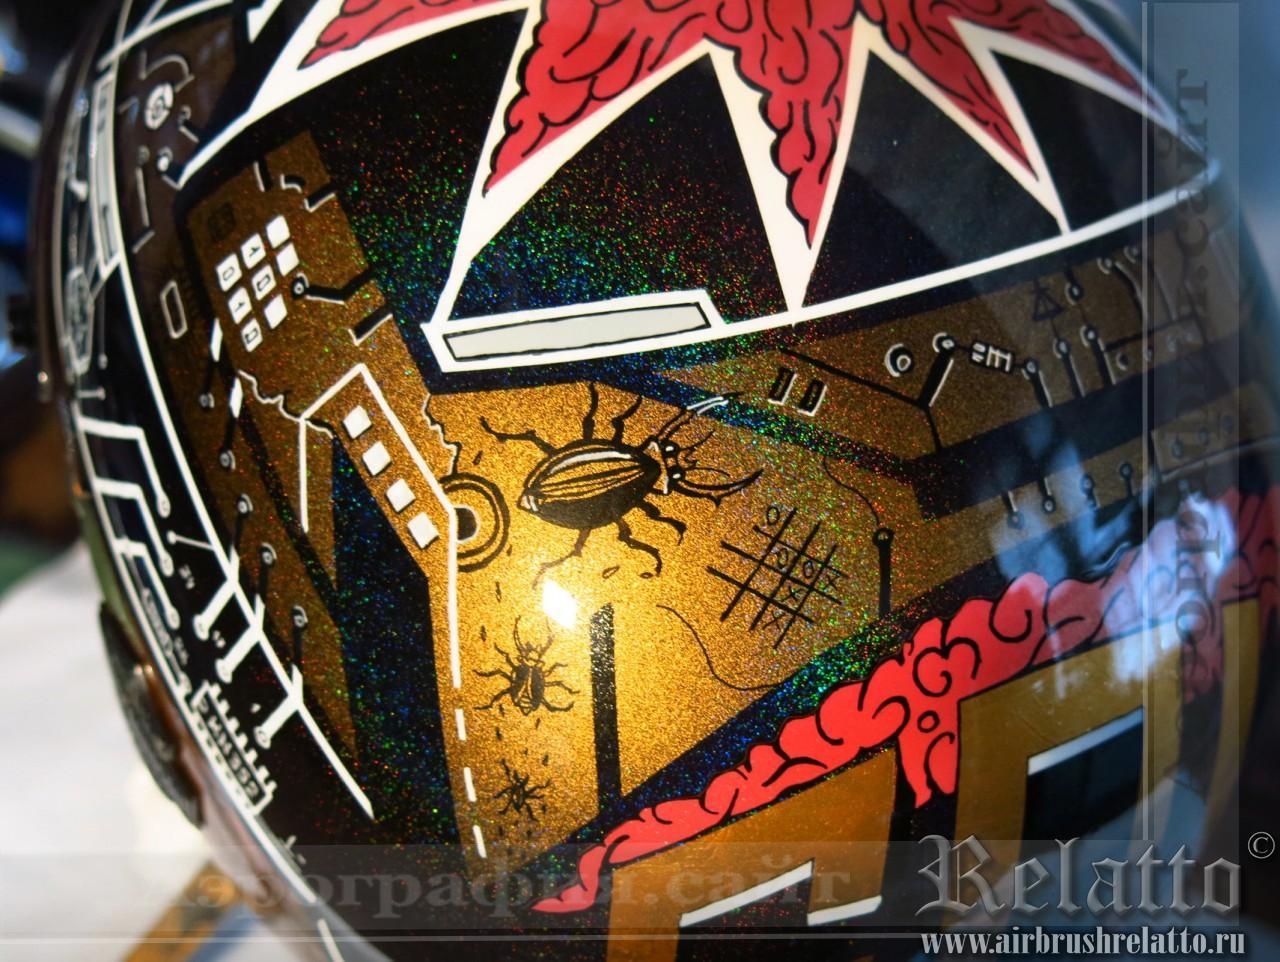 аэрография на шлеме Harley Davidson Псков